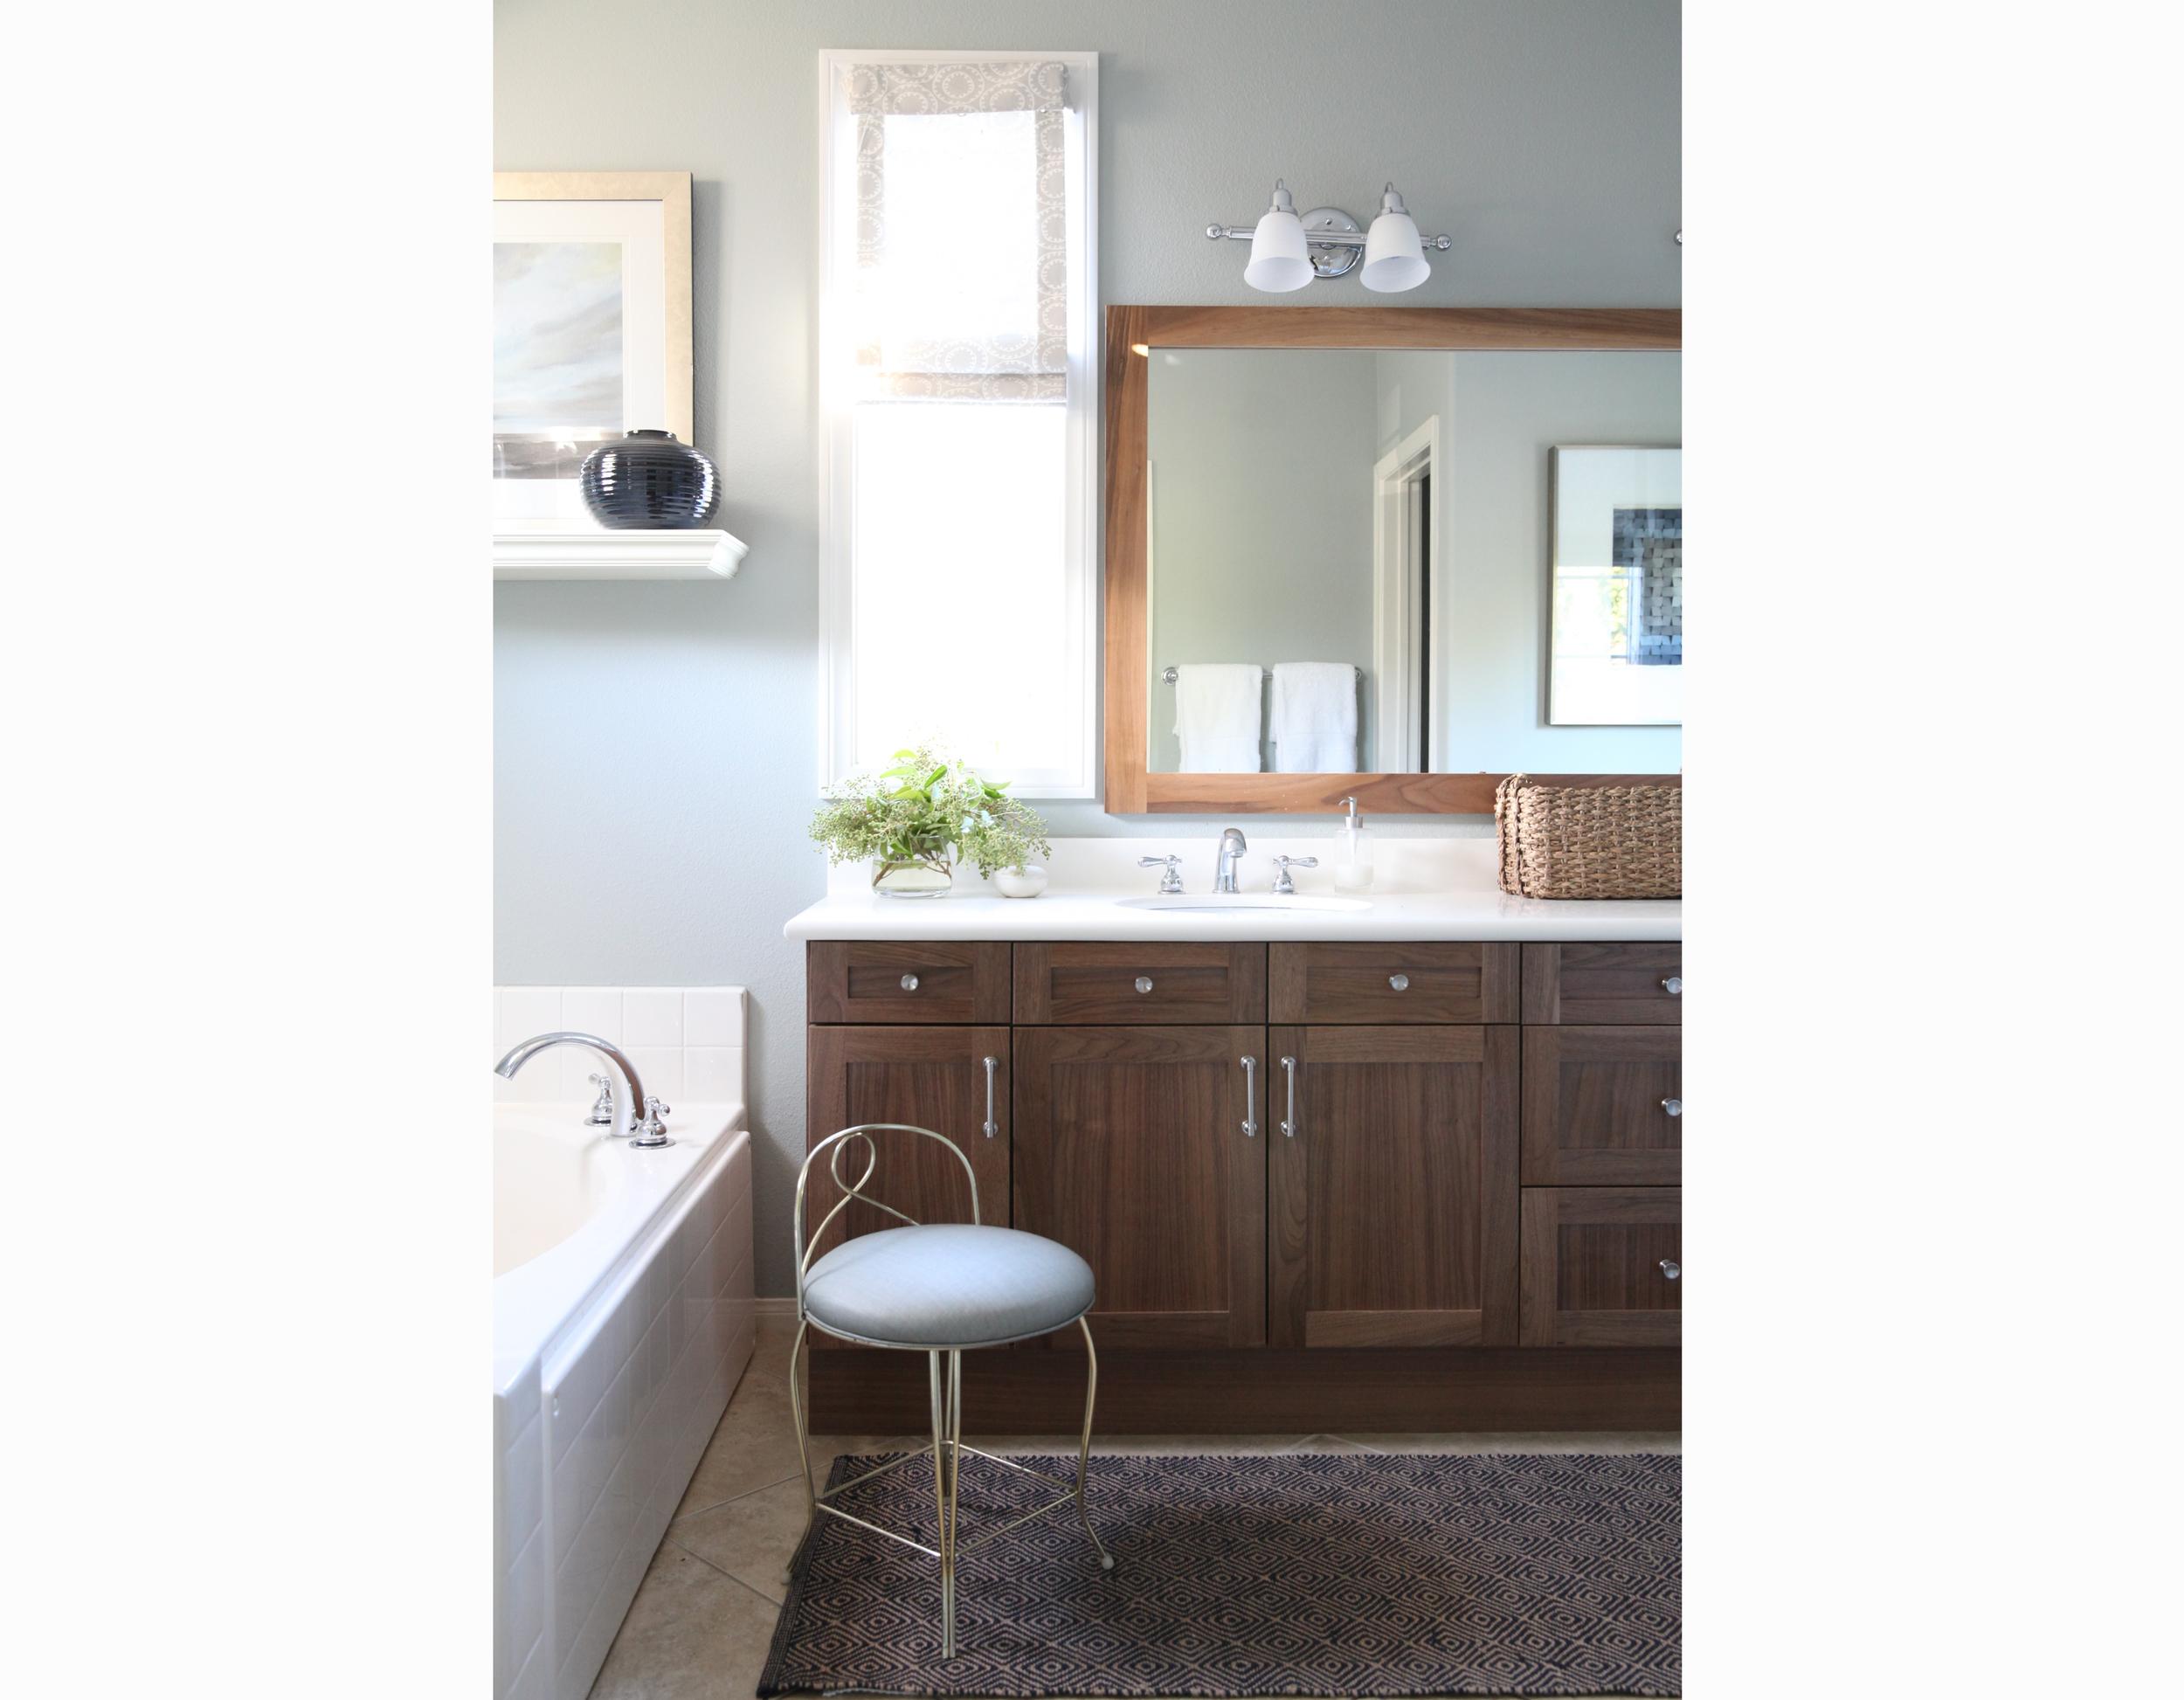 irvine interior designer brittany stiles orange county bathroom 2.jpg